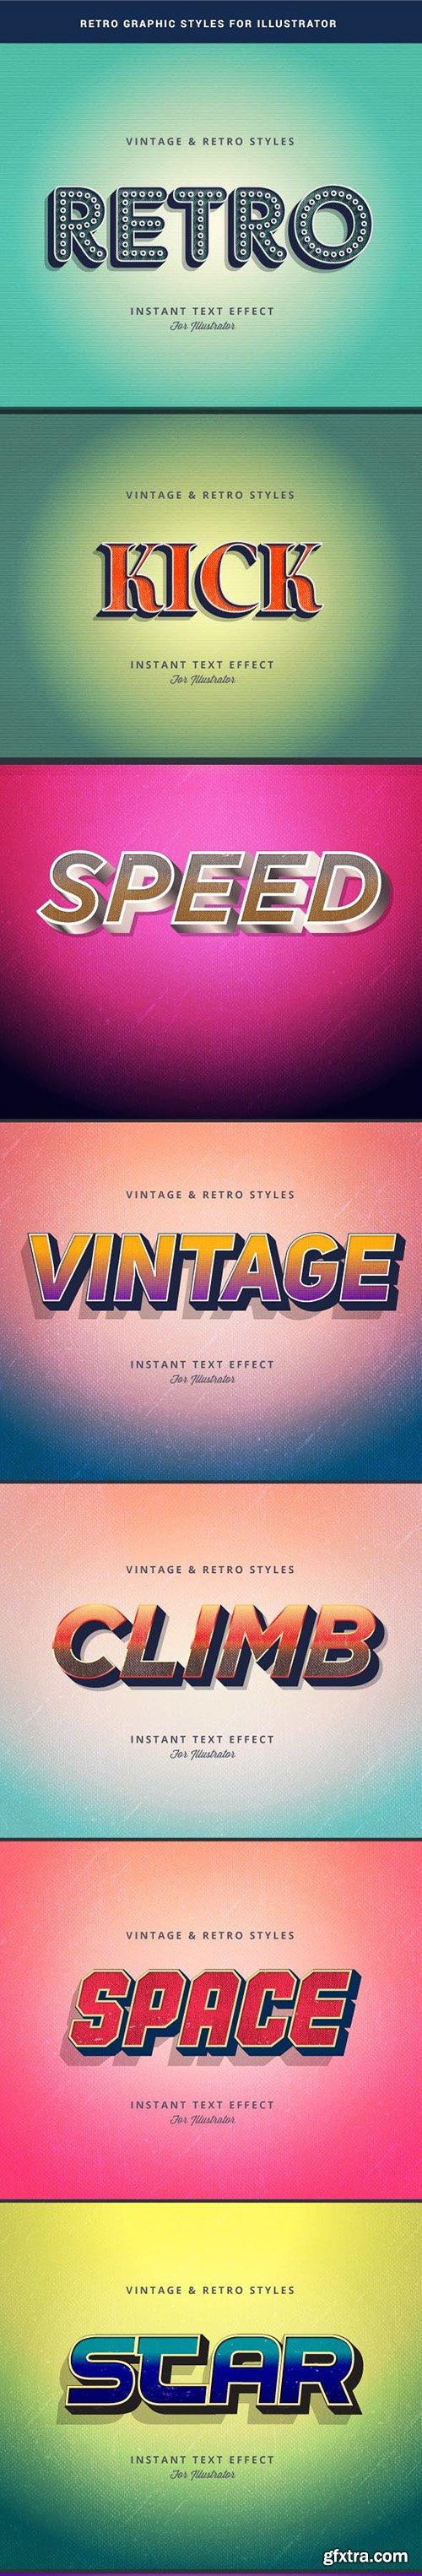 Graphicriver Retro Text Effect for Adobe Illutrator 22959941